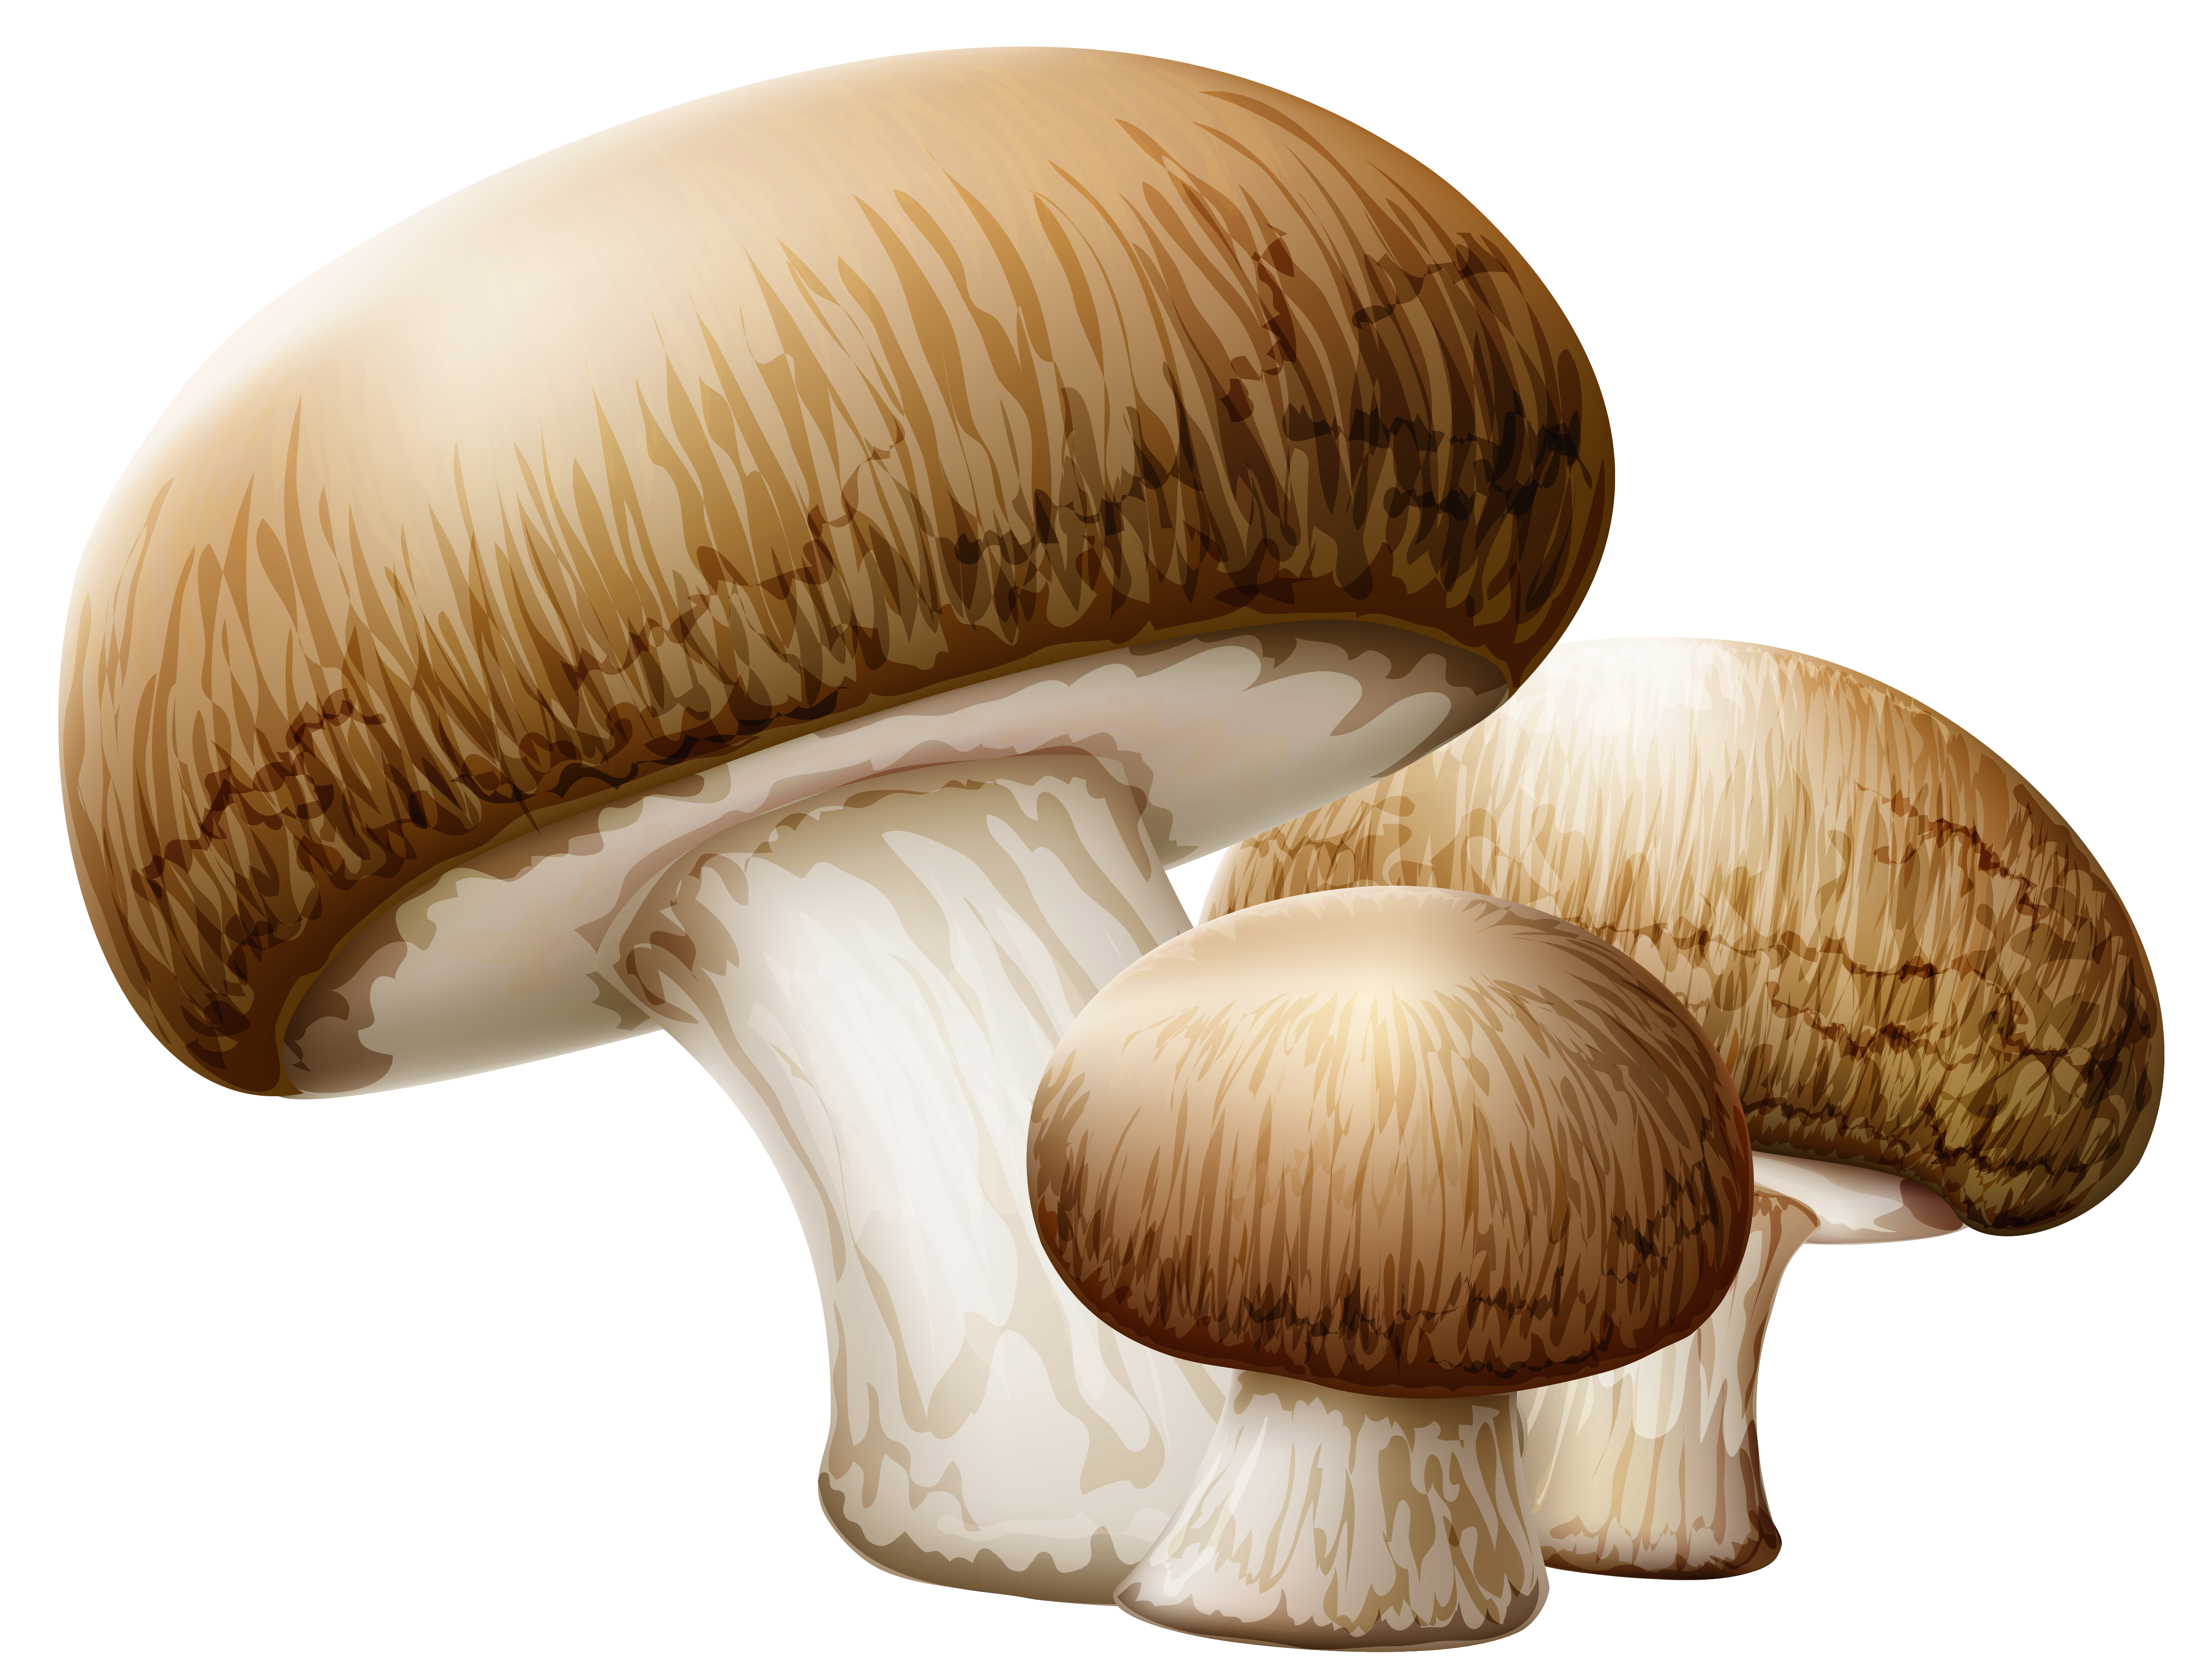 Mushroom clipart png.